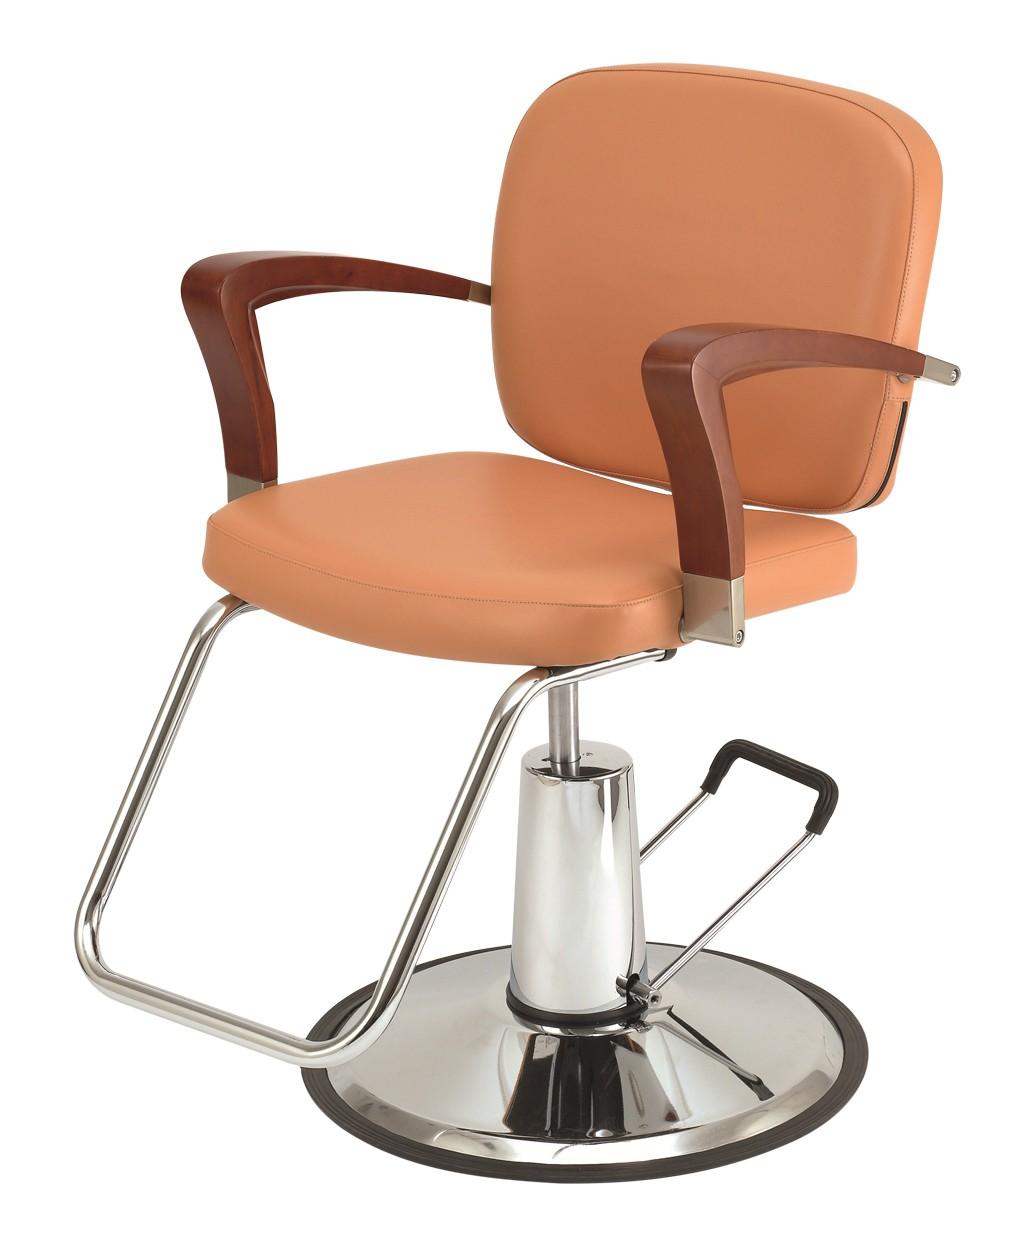 Pibbs 3806 Verona Styling Chair